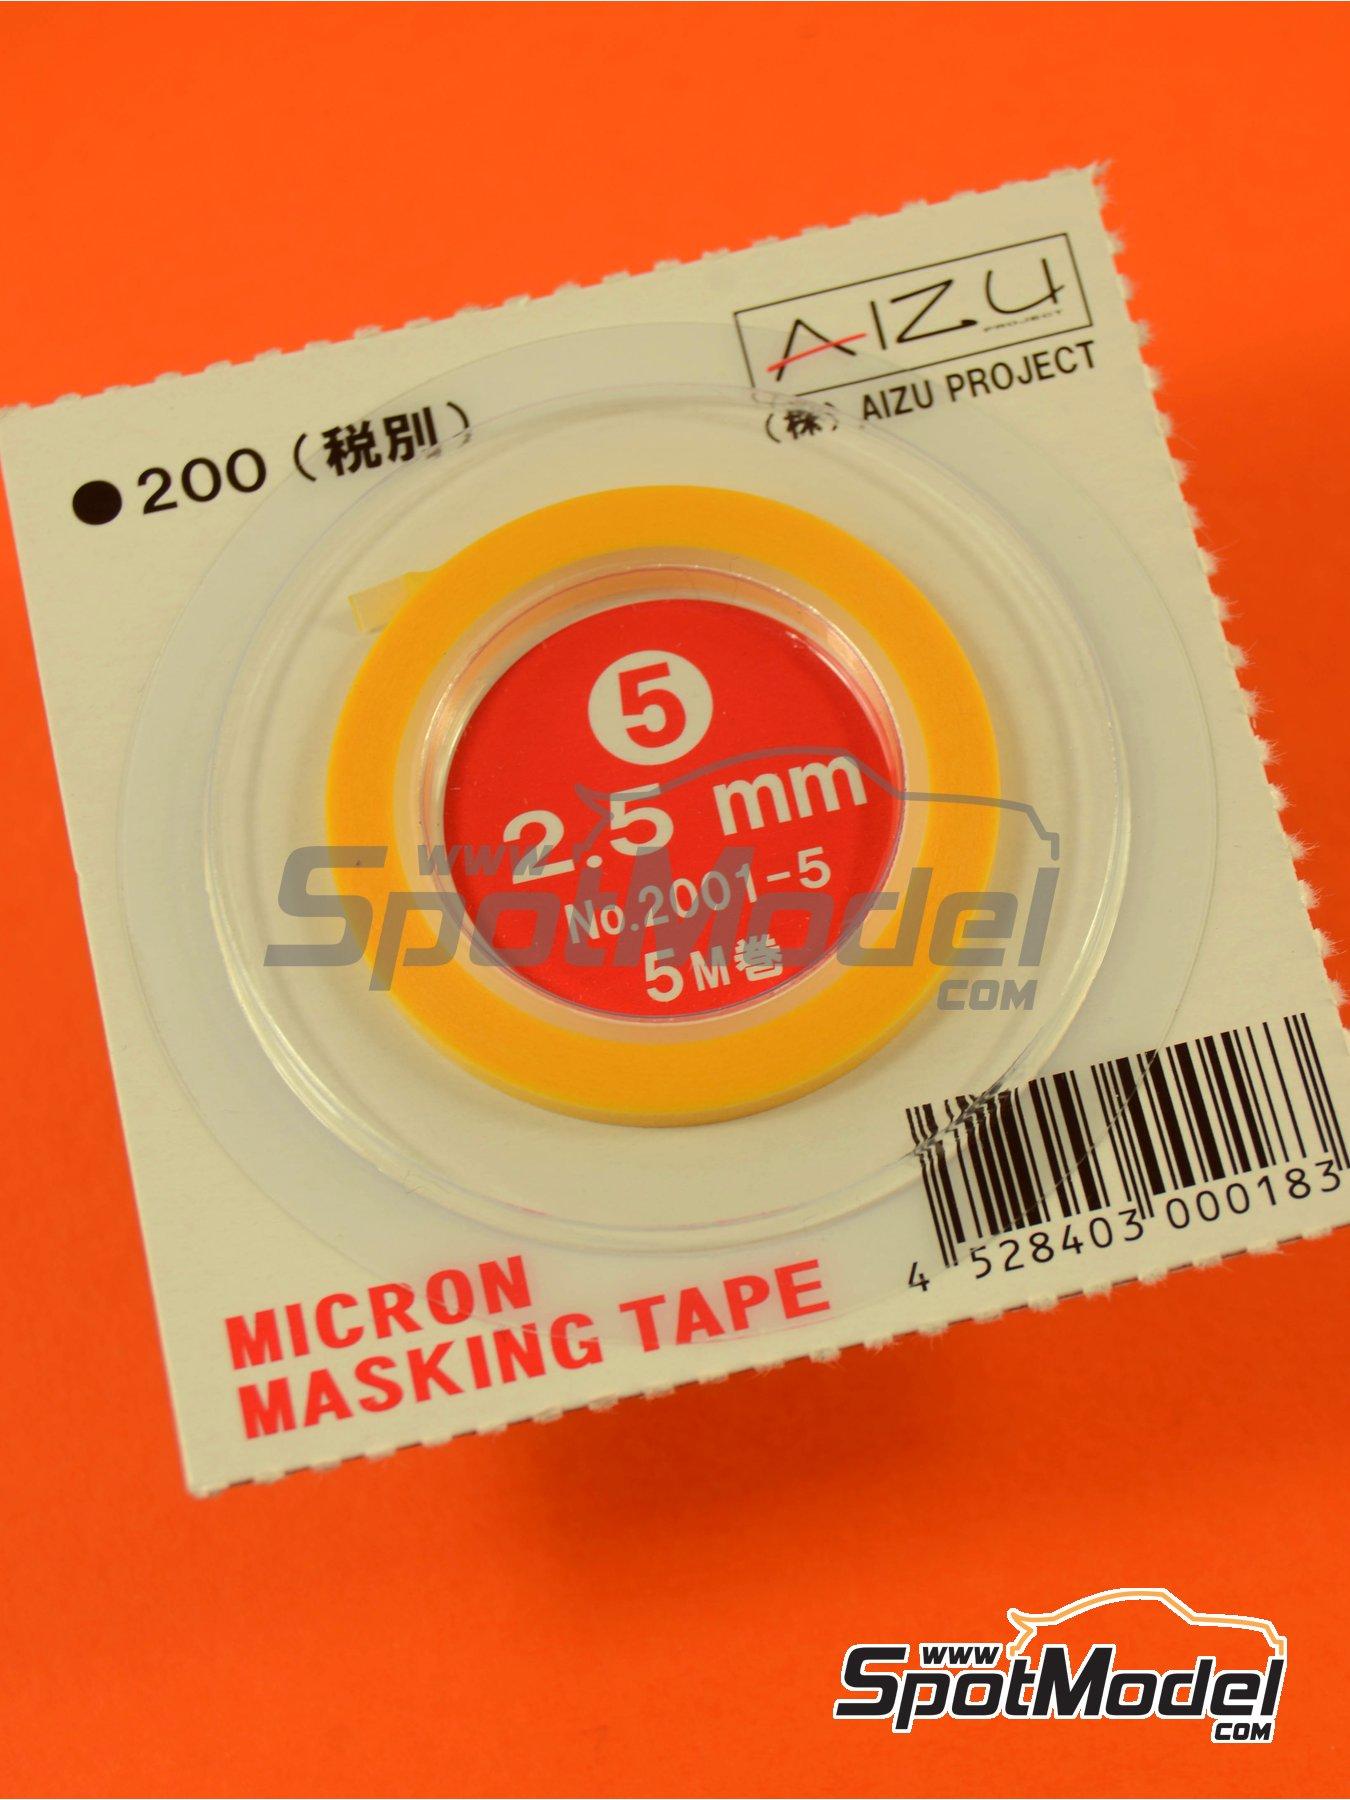 Micron masking tape 2,5mm x 5m | Masks manufactured by Aizu Project (ref.AIZU-2001-5) image